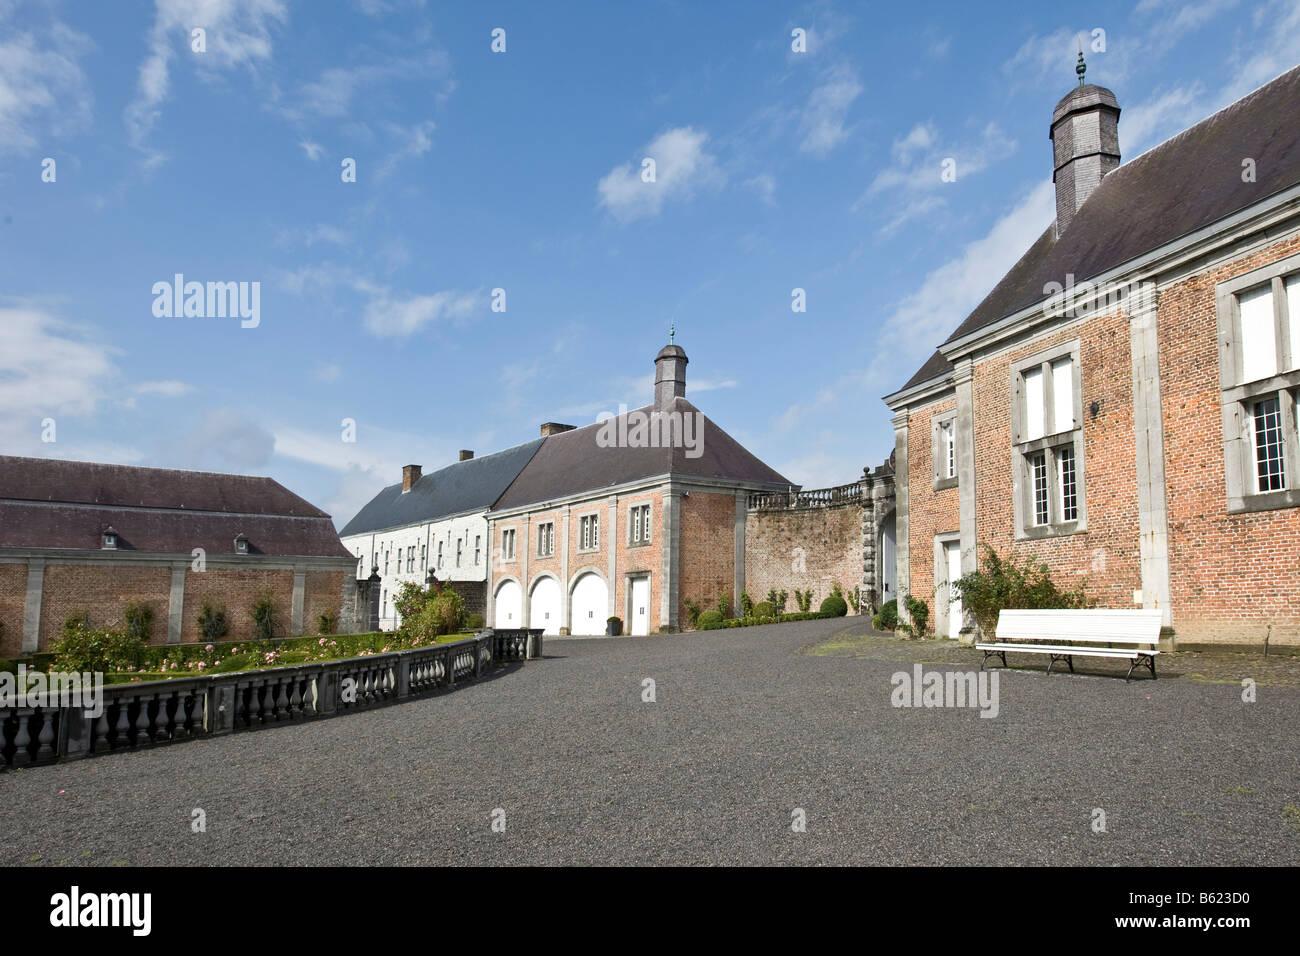 Château de Modave, Castle of Modave, stables, Modave, Liège Province, Belgium, Europe Stock Photo